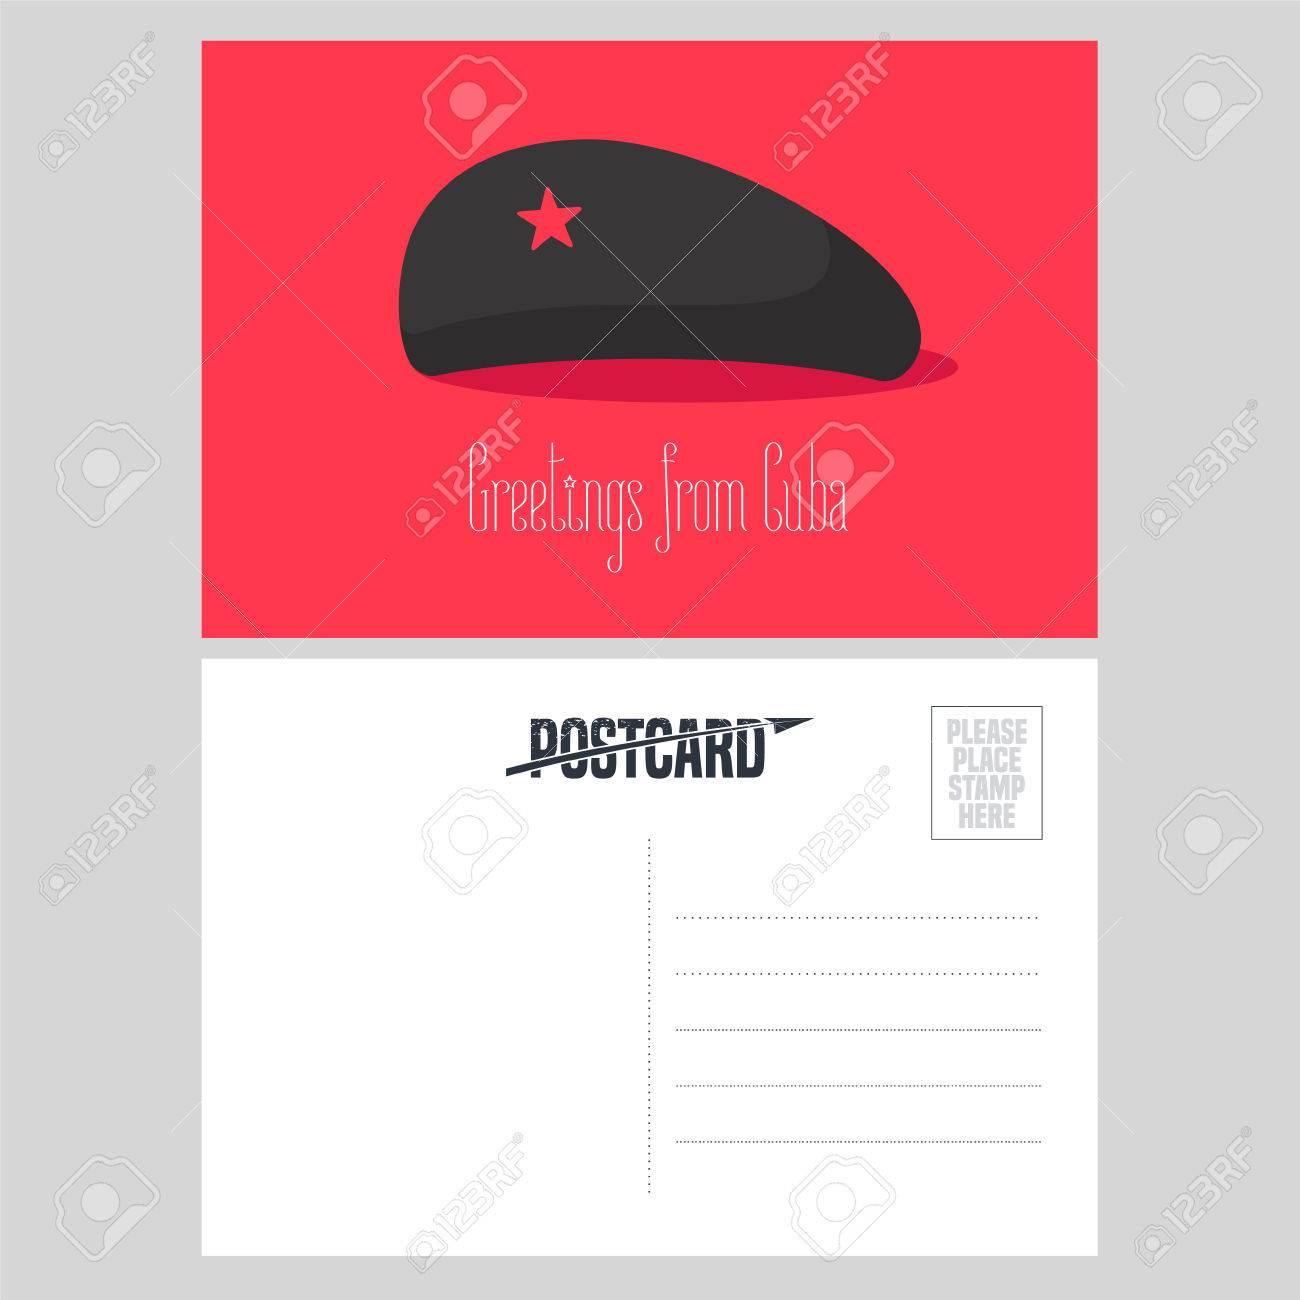 Berühmt Standard Postkarte Vorlage Bilder - Entry Level Resume ...